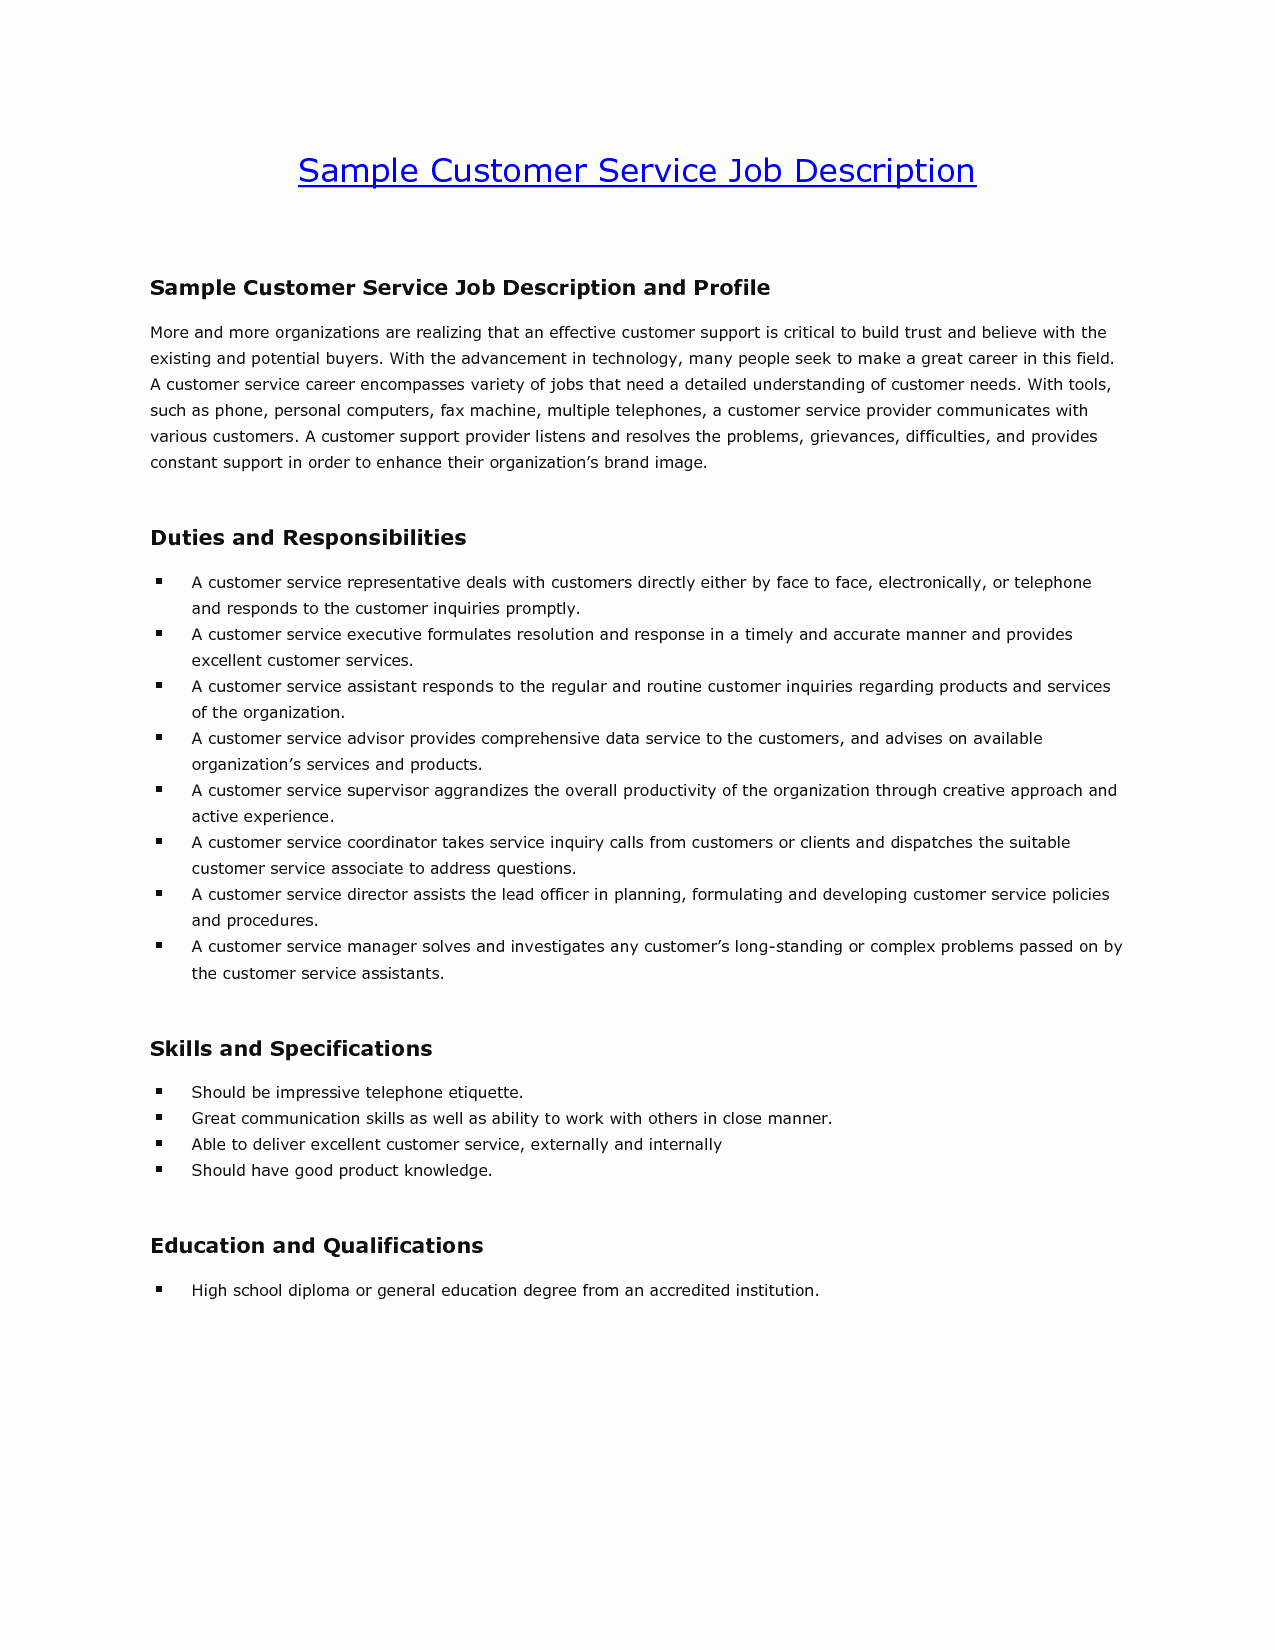 Customer Service Retail Job Description for Resume